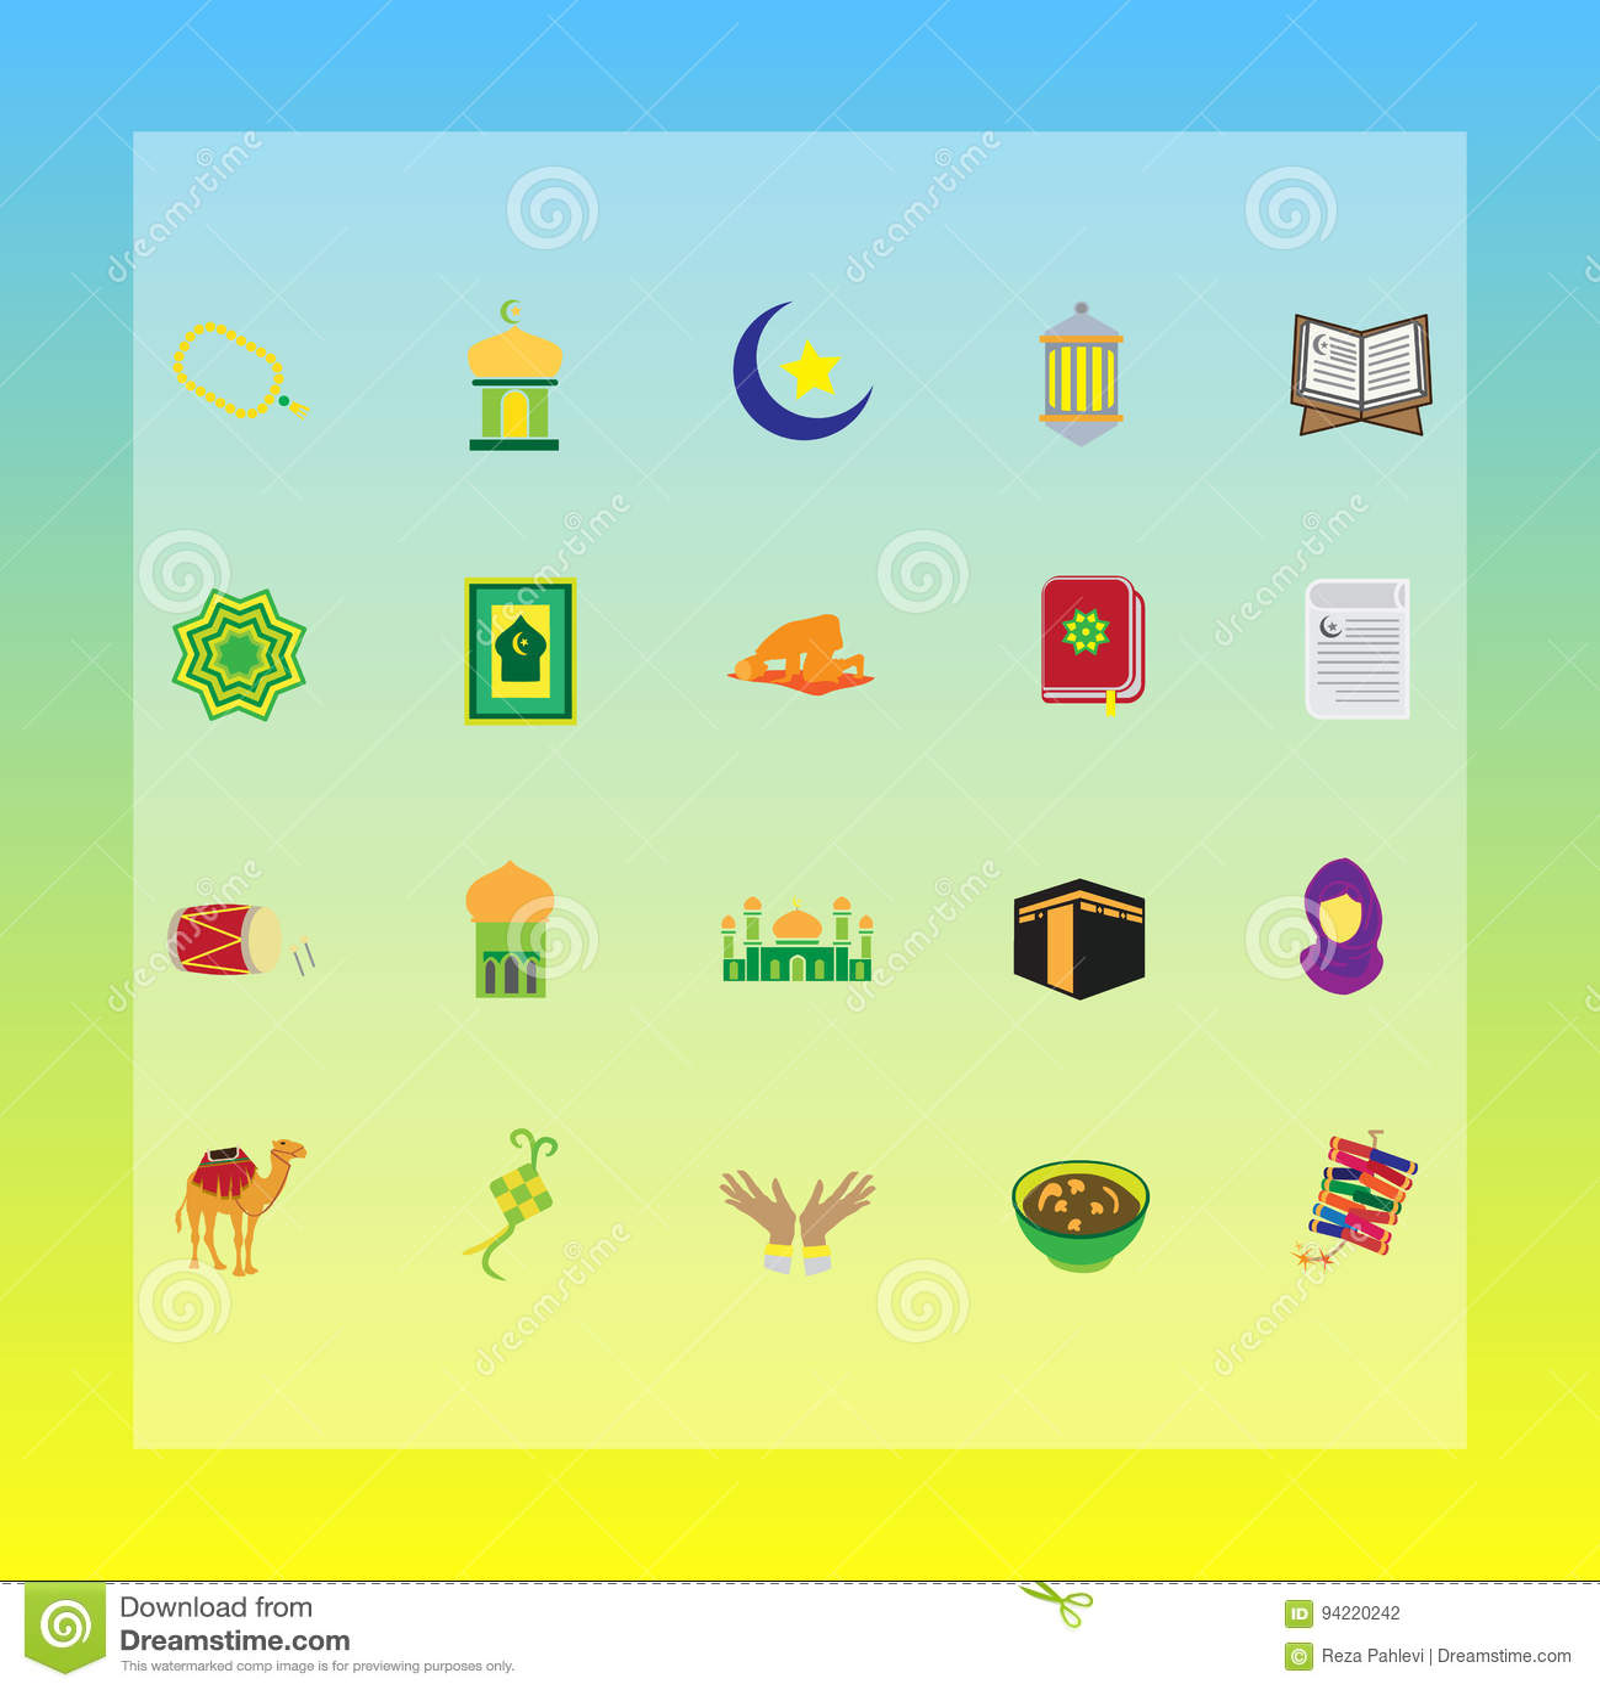 Islamic Muslim Concept Flat Icons For Ramadhan Hajj Eid Mubarak